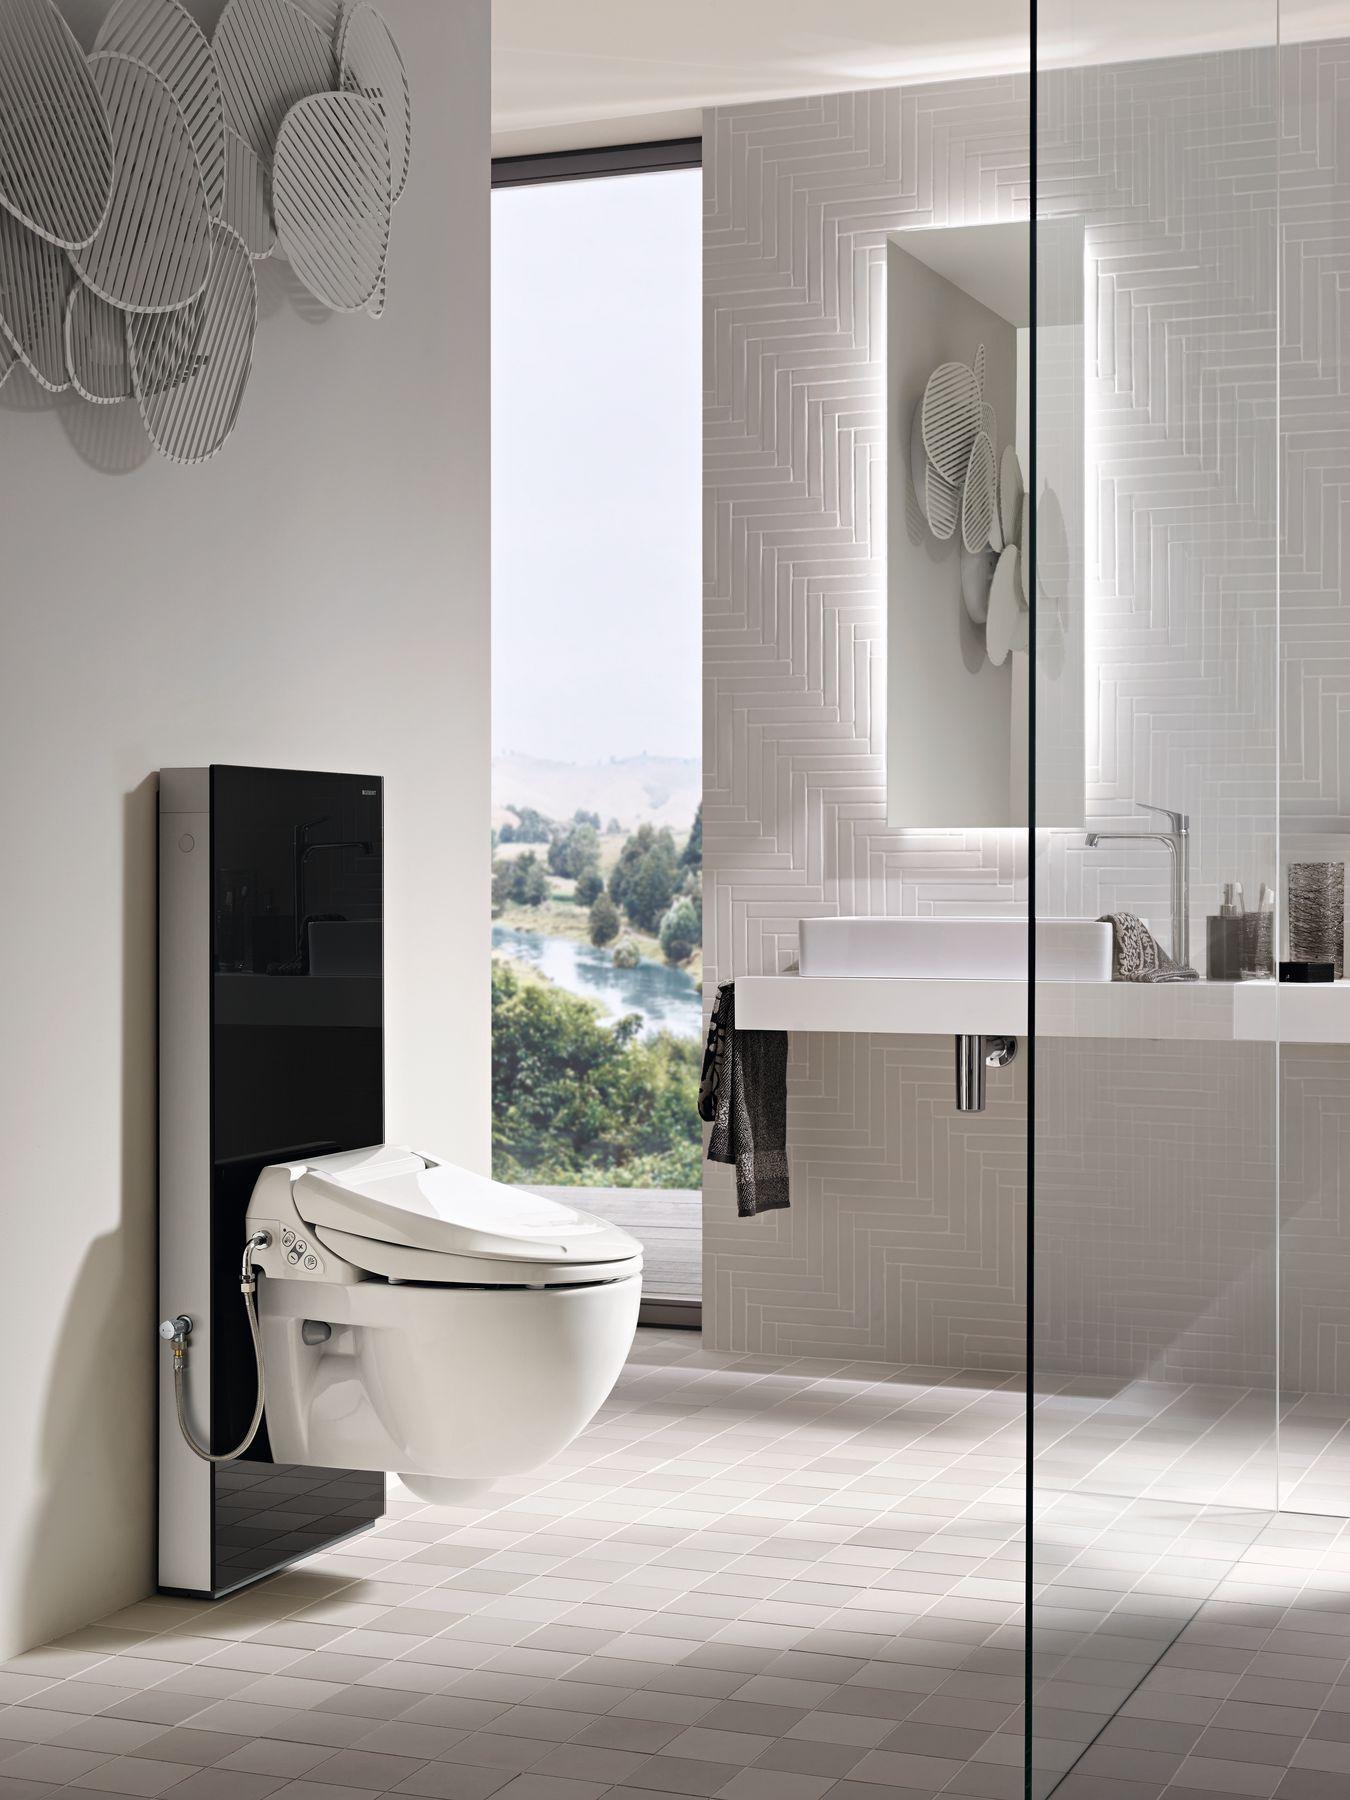 Geberit Aquaclean 4000 With Geberit Sanitary Module Monolith Showertoilet Bad Inspiration Wc Mit Dusche Standdusche